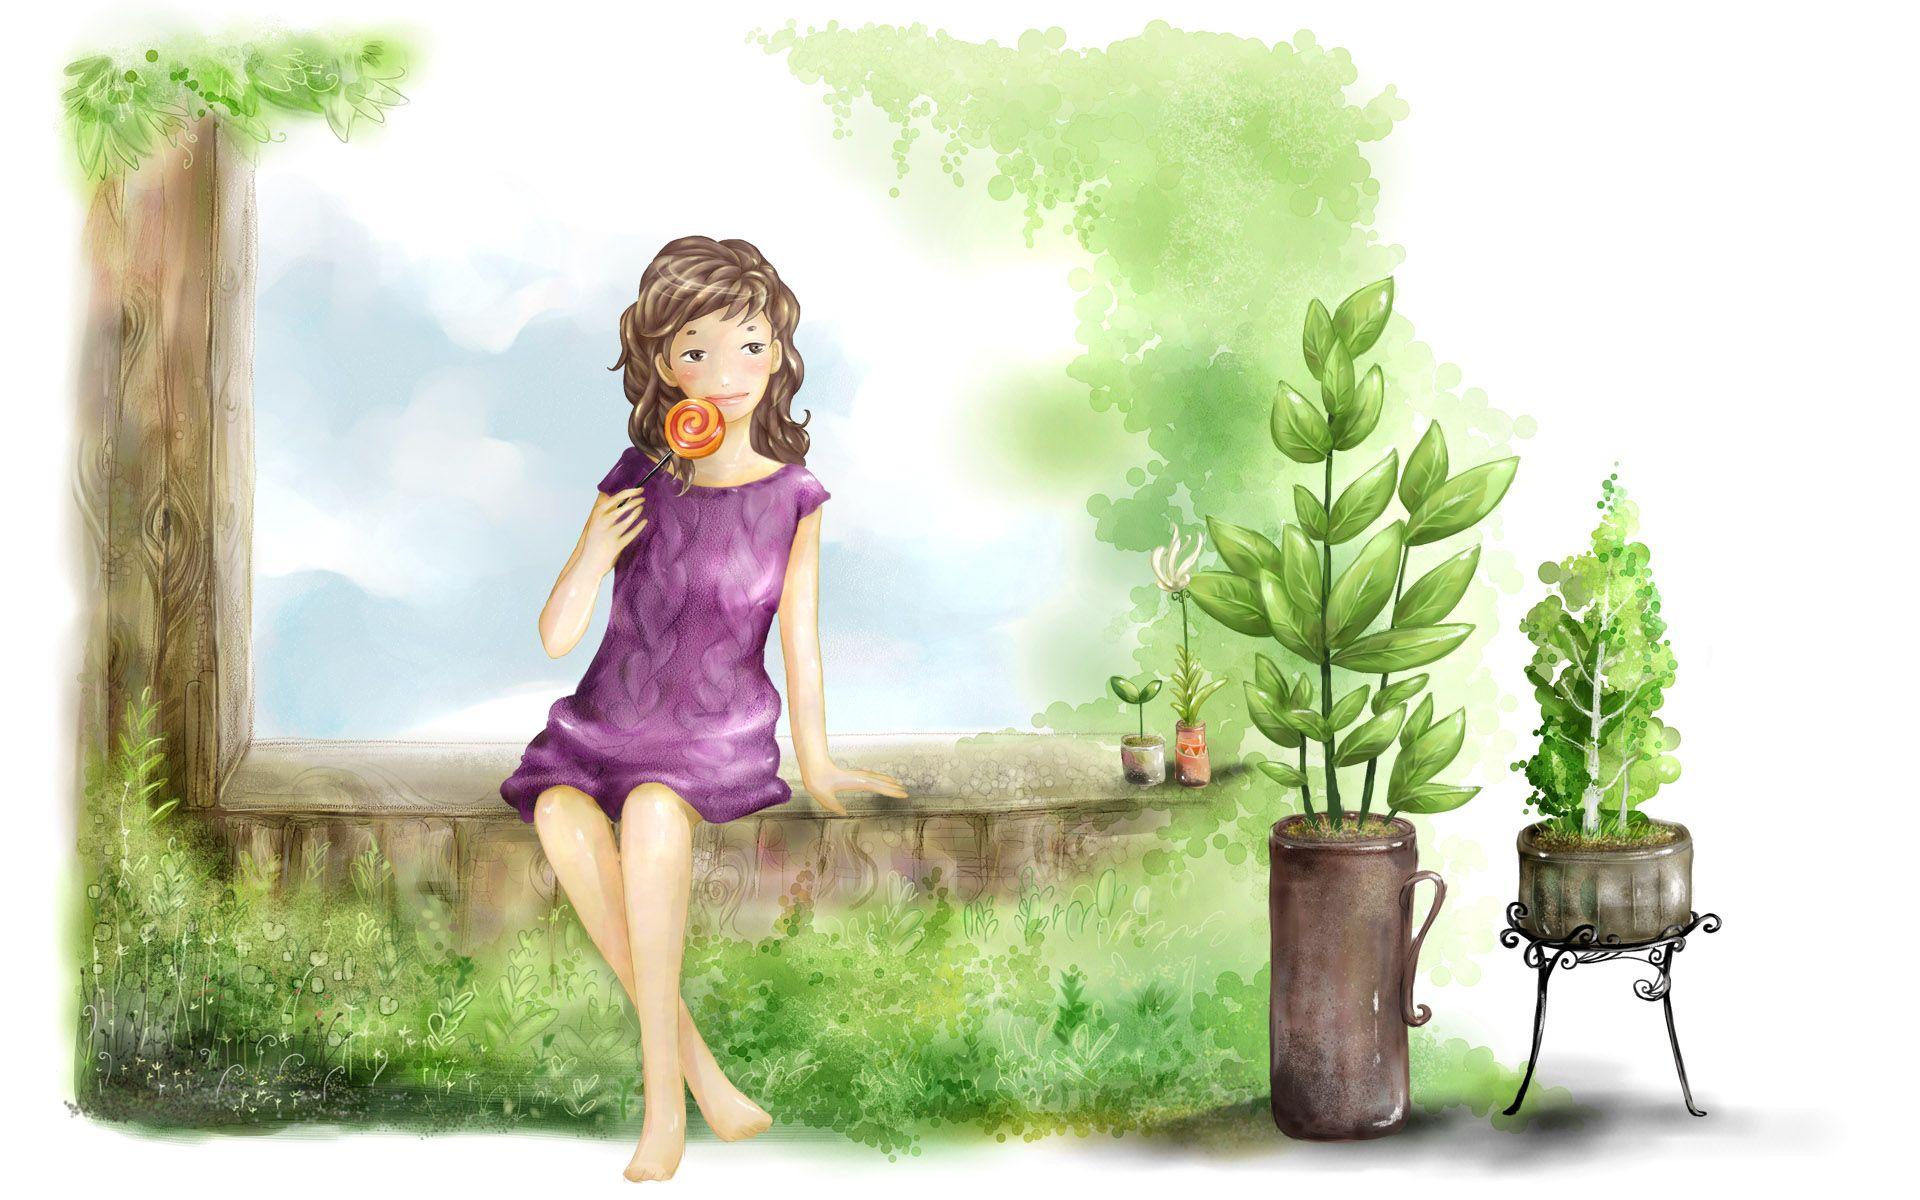 d Fantasy Girl Wallpaper Cute Animated Girls Wallpapers